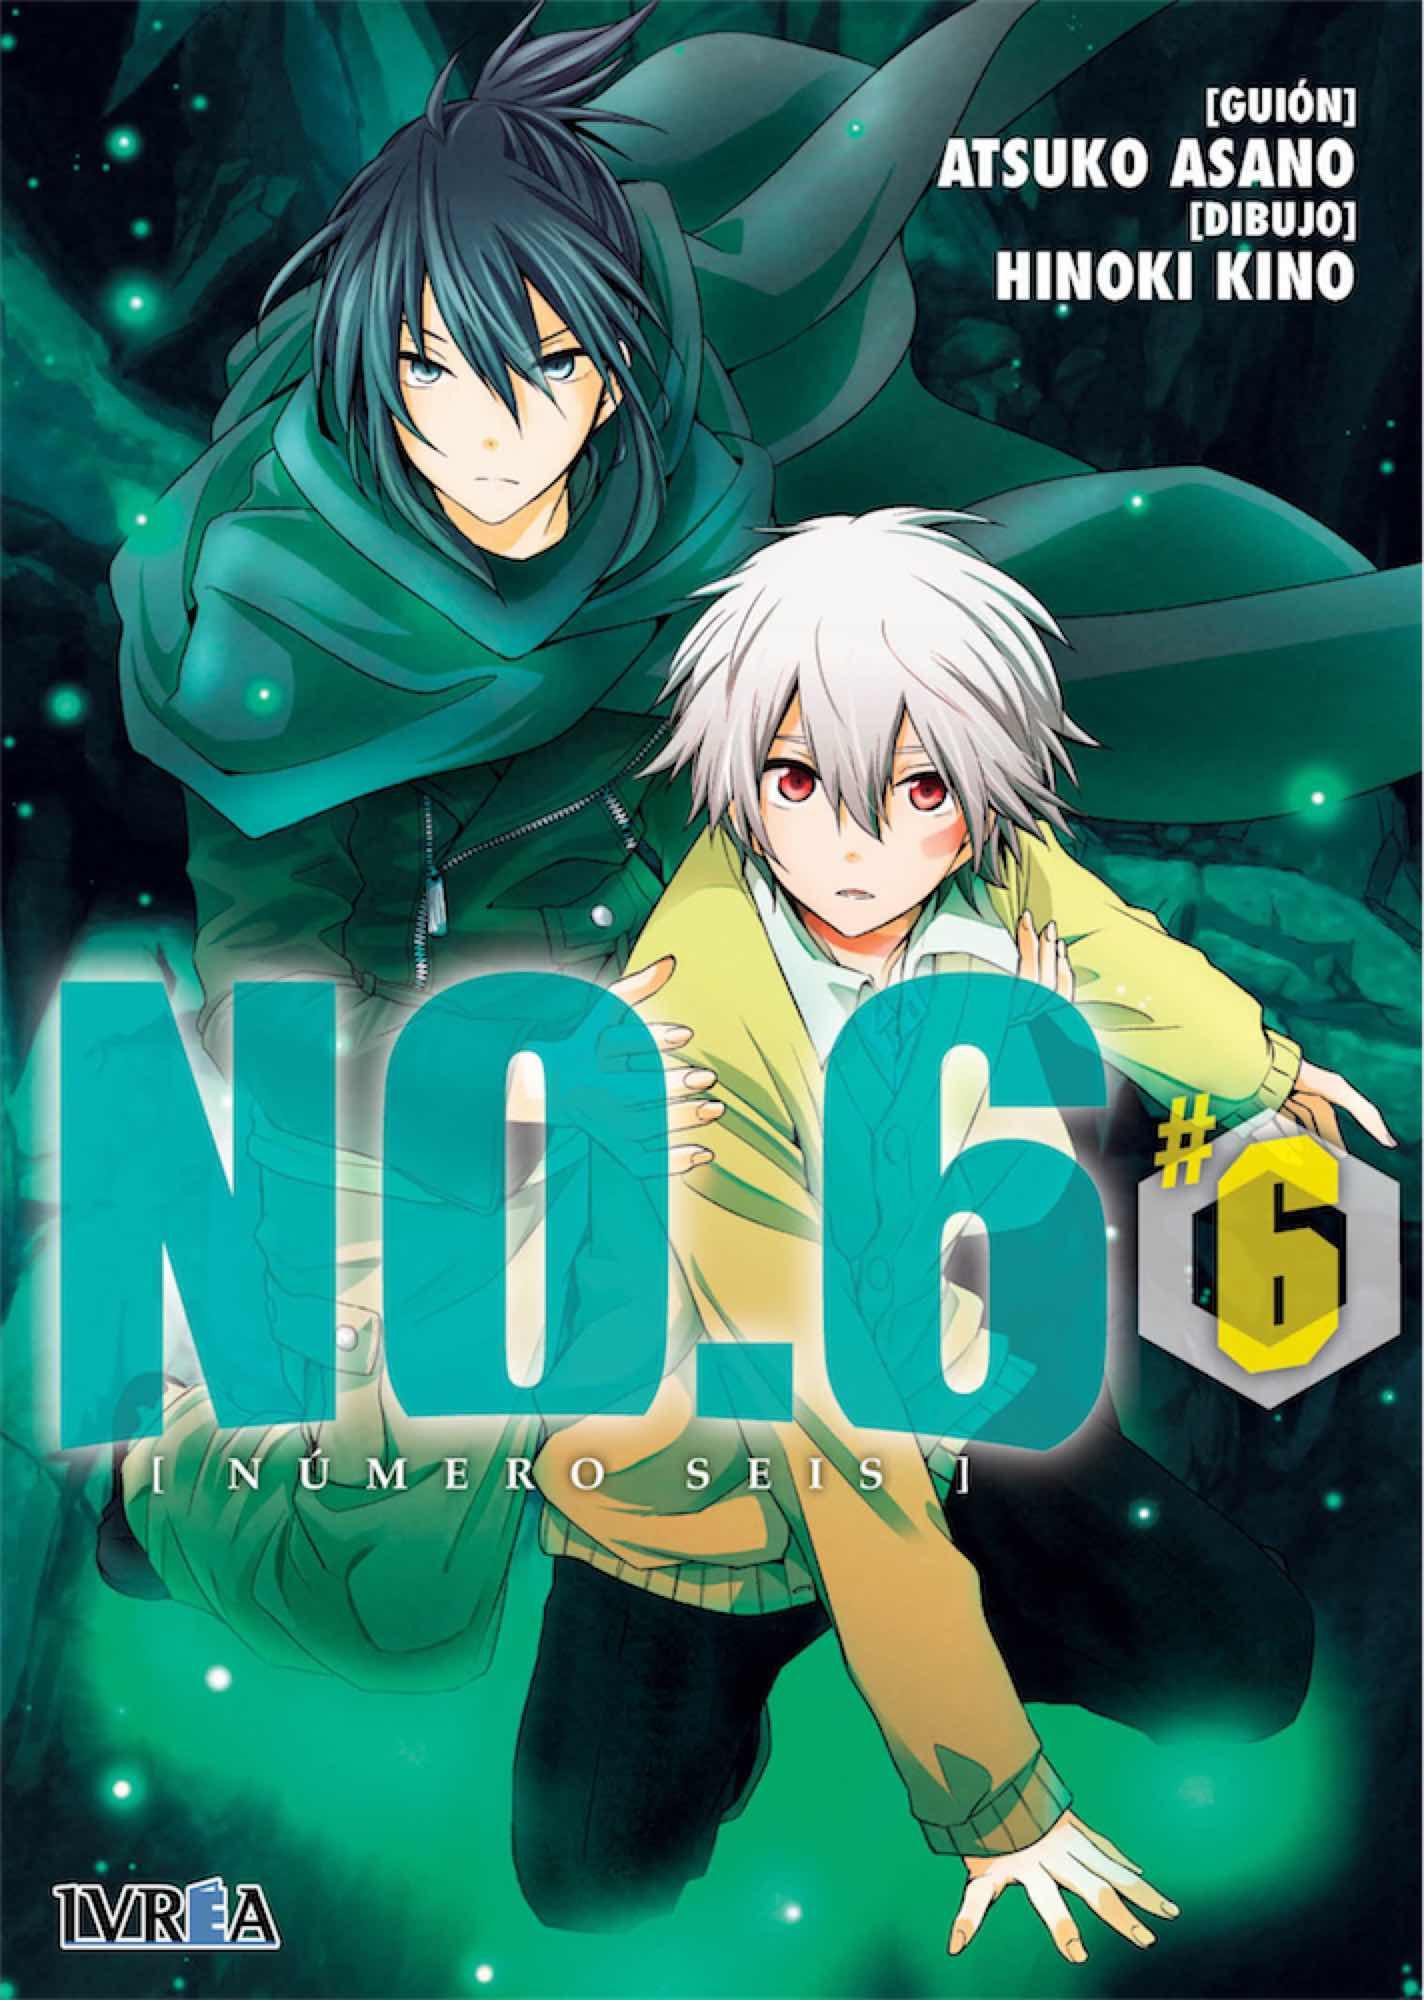 NO.6 06 (NUMERO SEIS) COMIC)